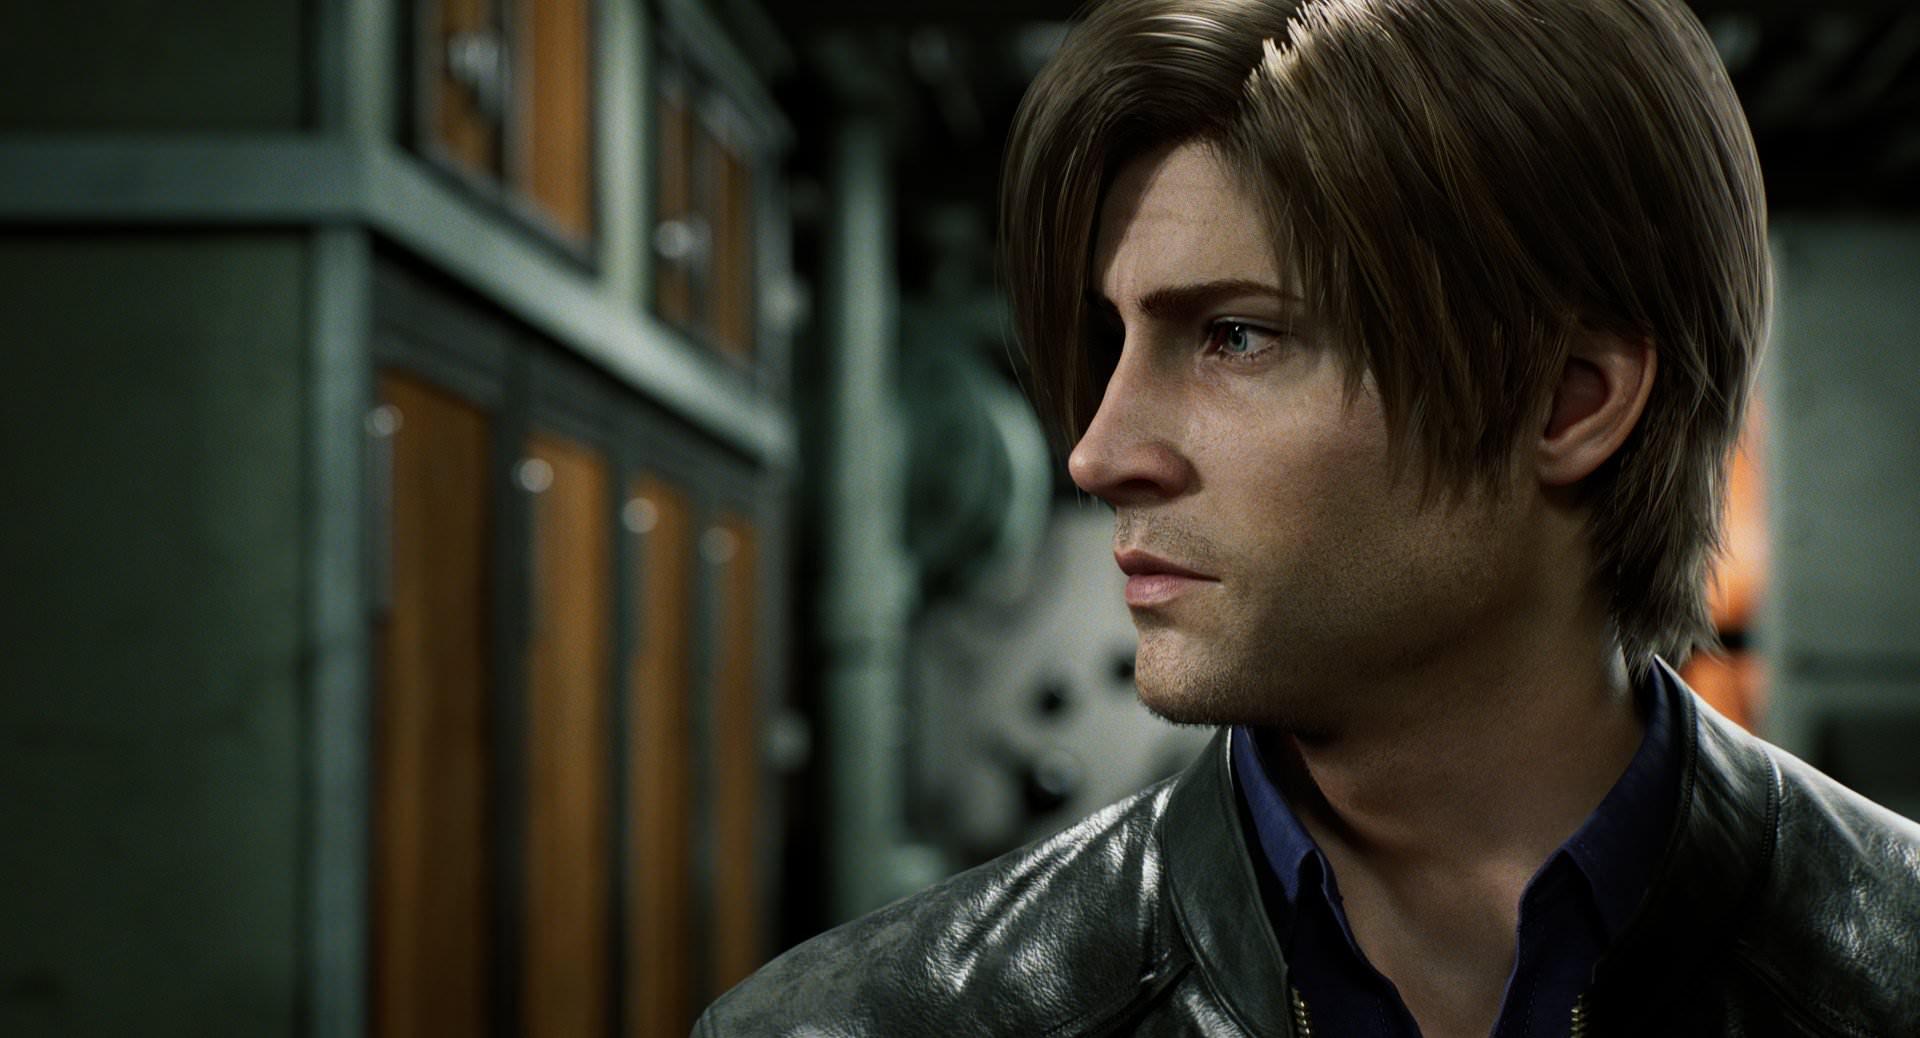 لئون اس کندی در سریال انیمیشنی Resident Evil: Infinite Darkness